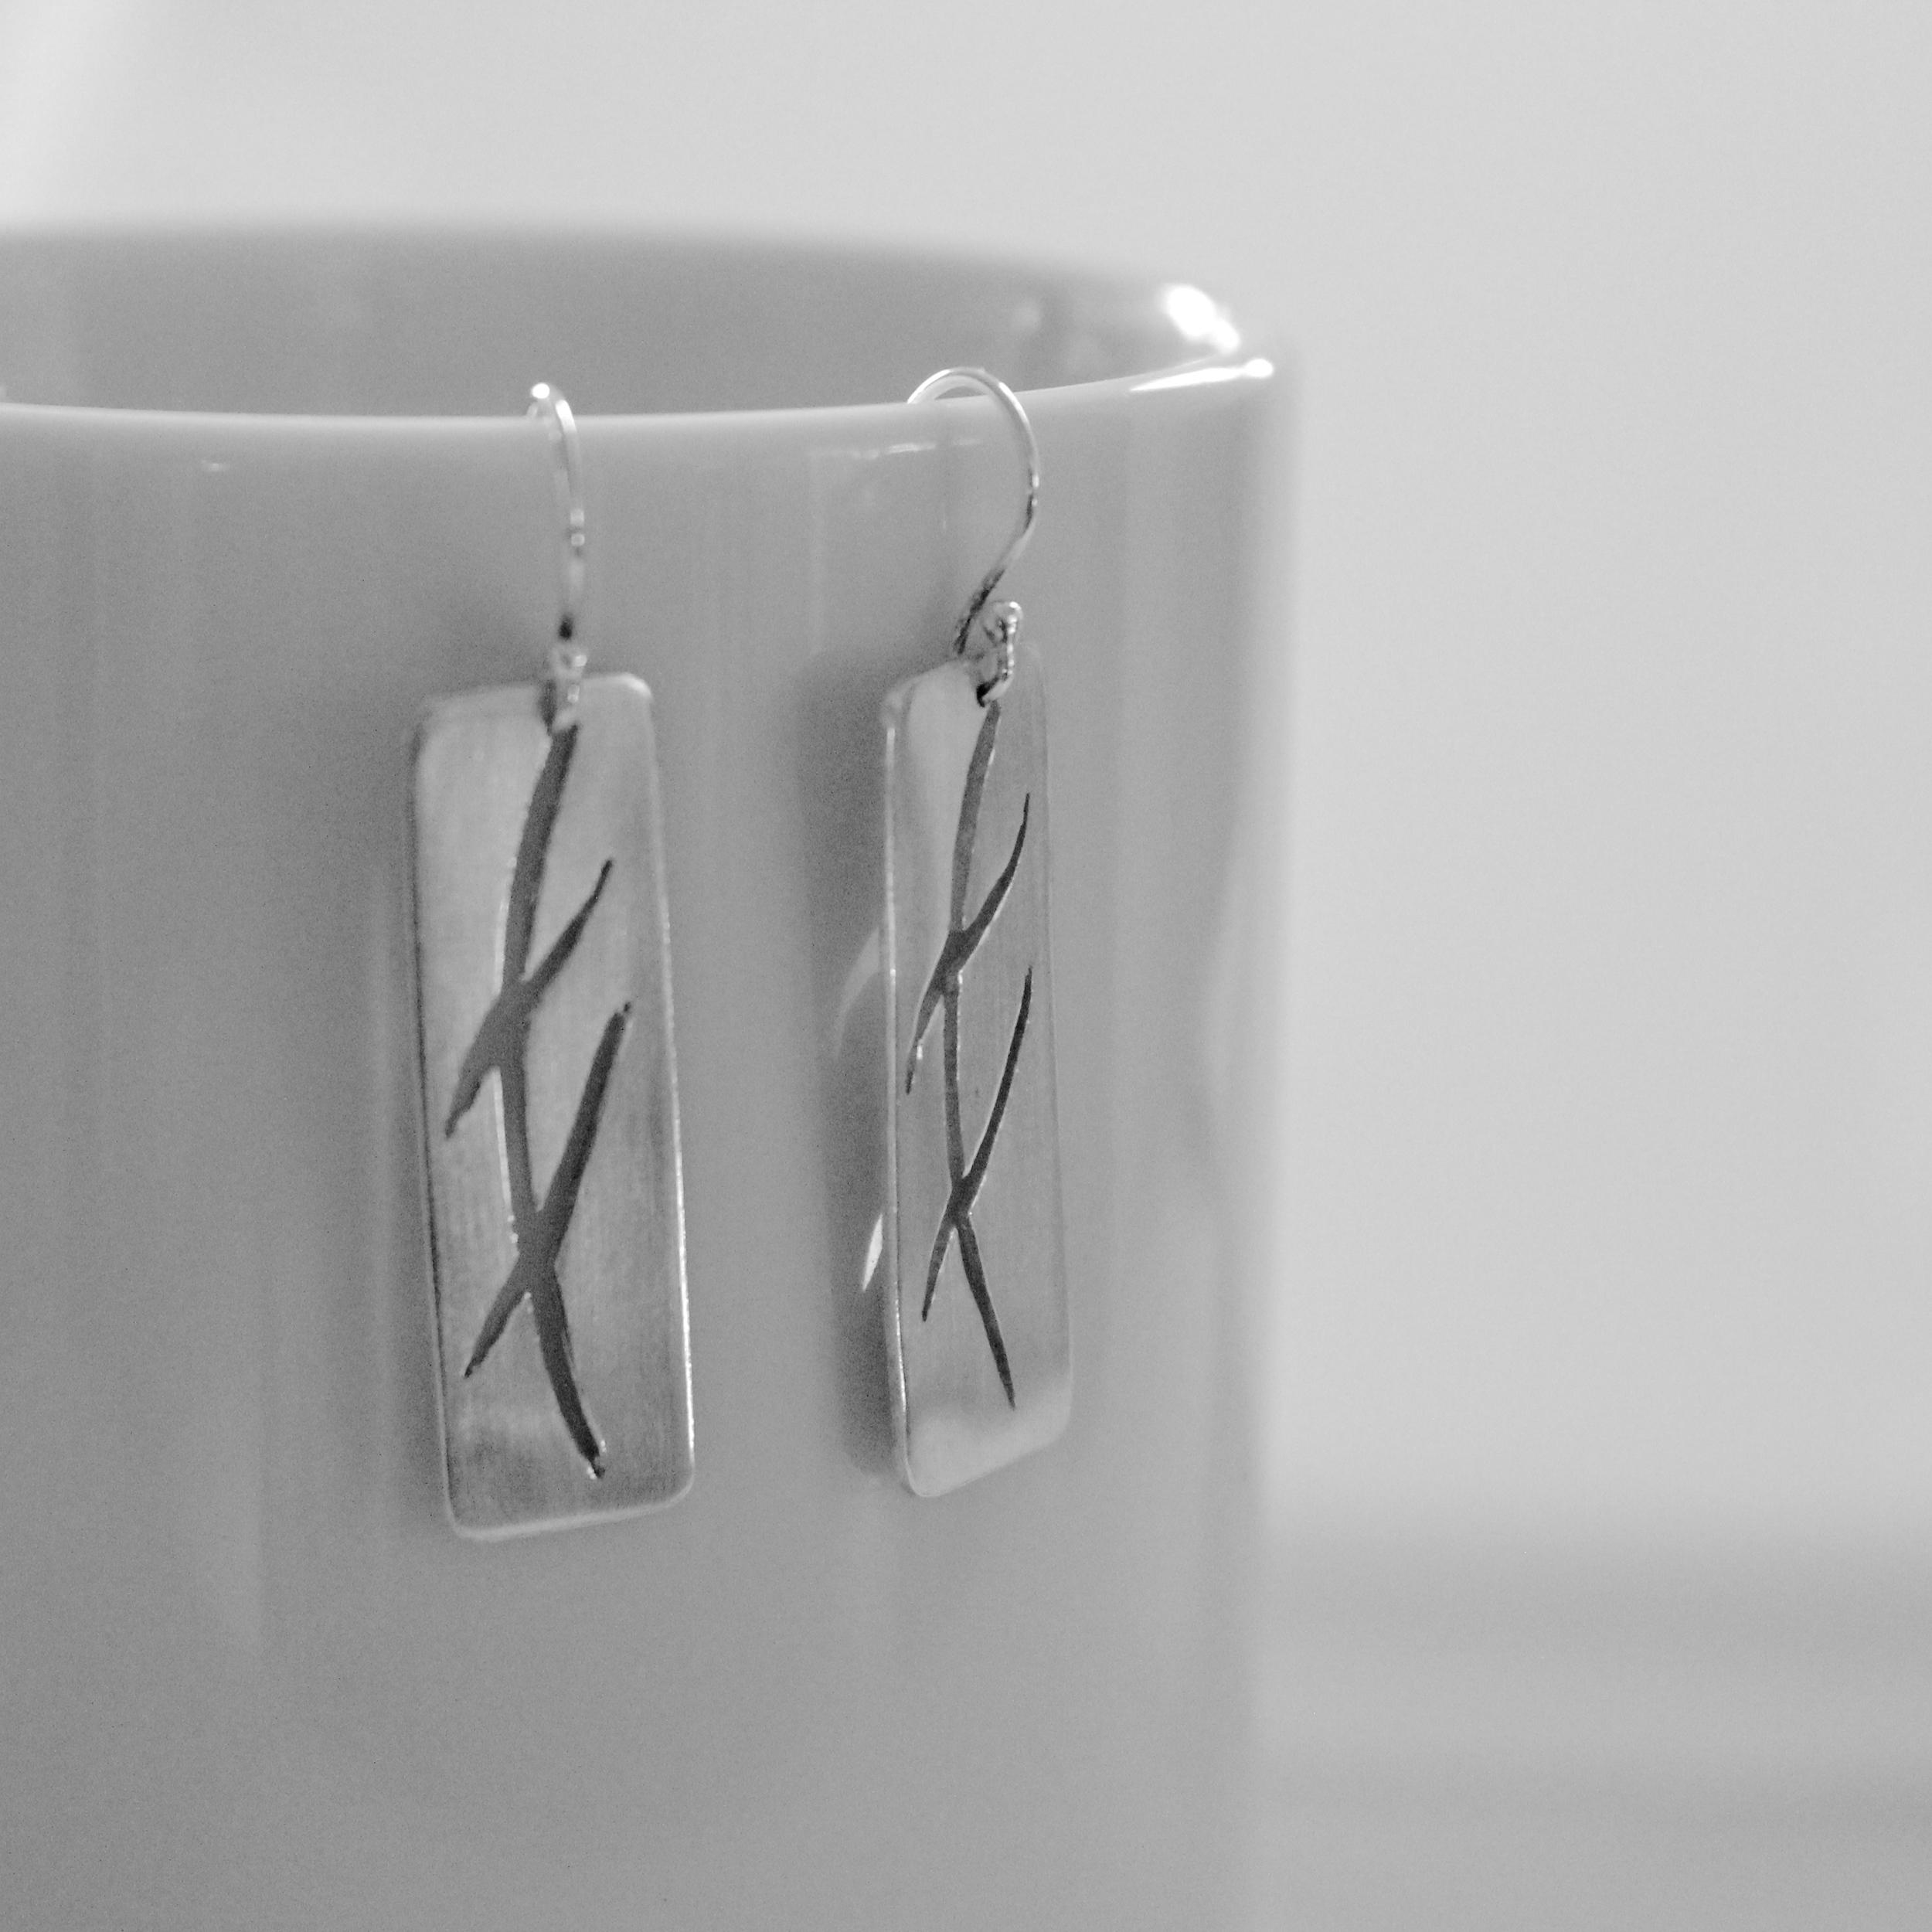 Criss Cross Brushstrokes in Silver